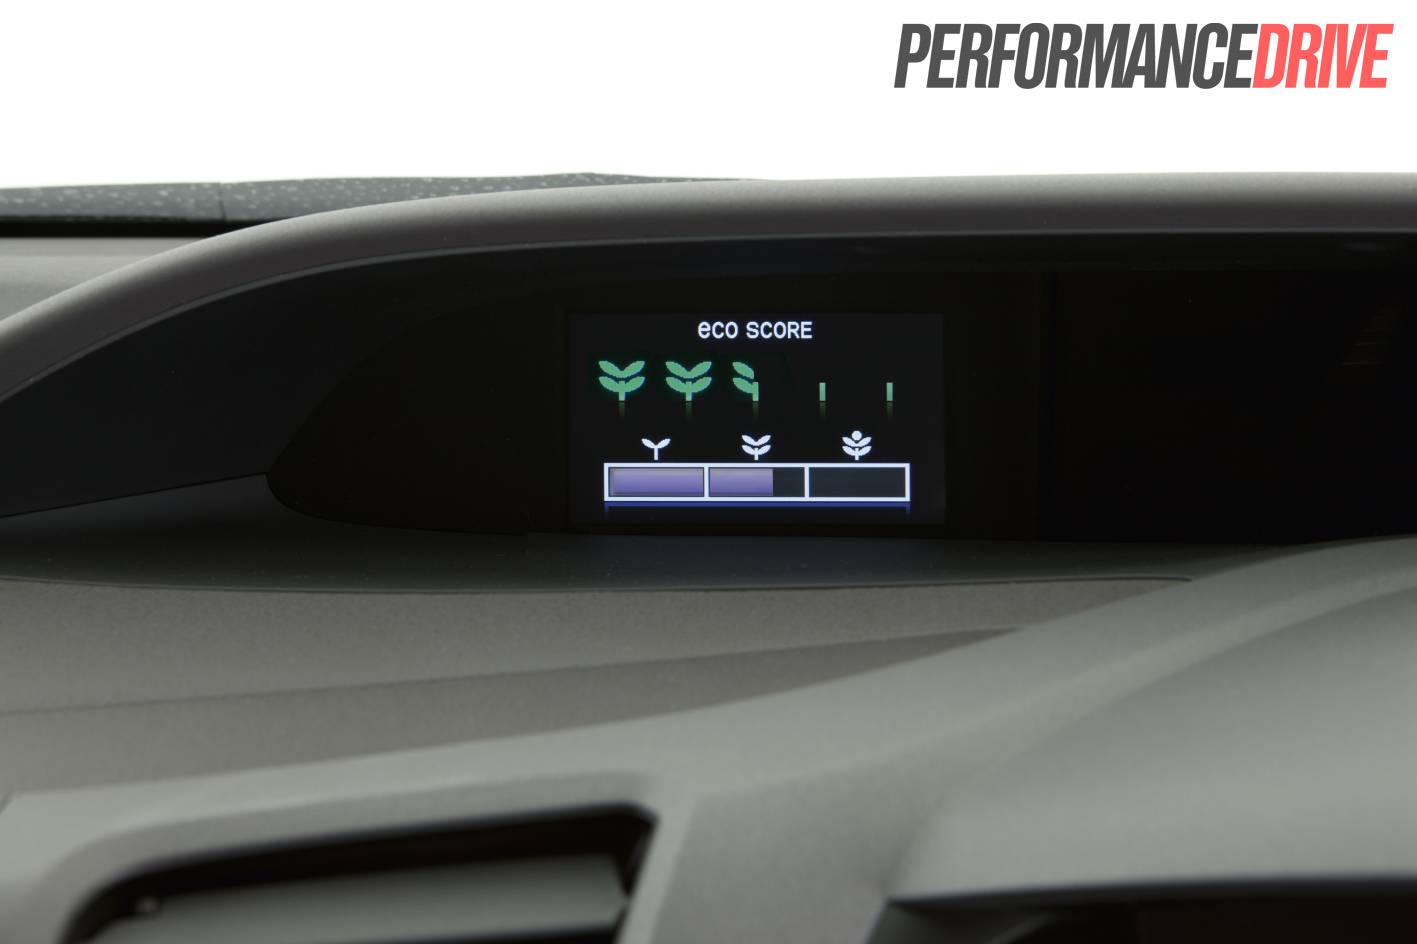 2012 Honda Civic Hybrid Review Performancedrive